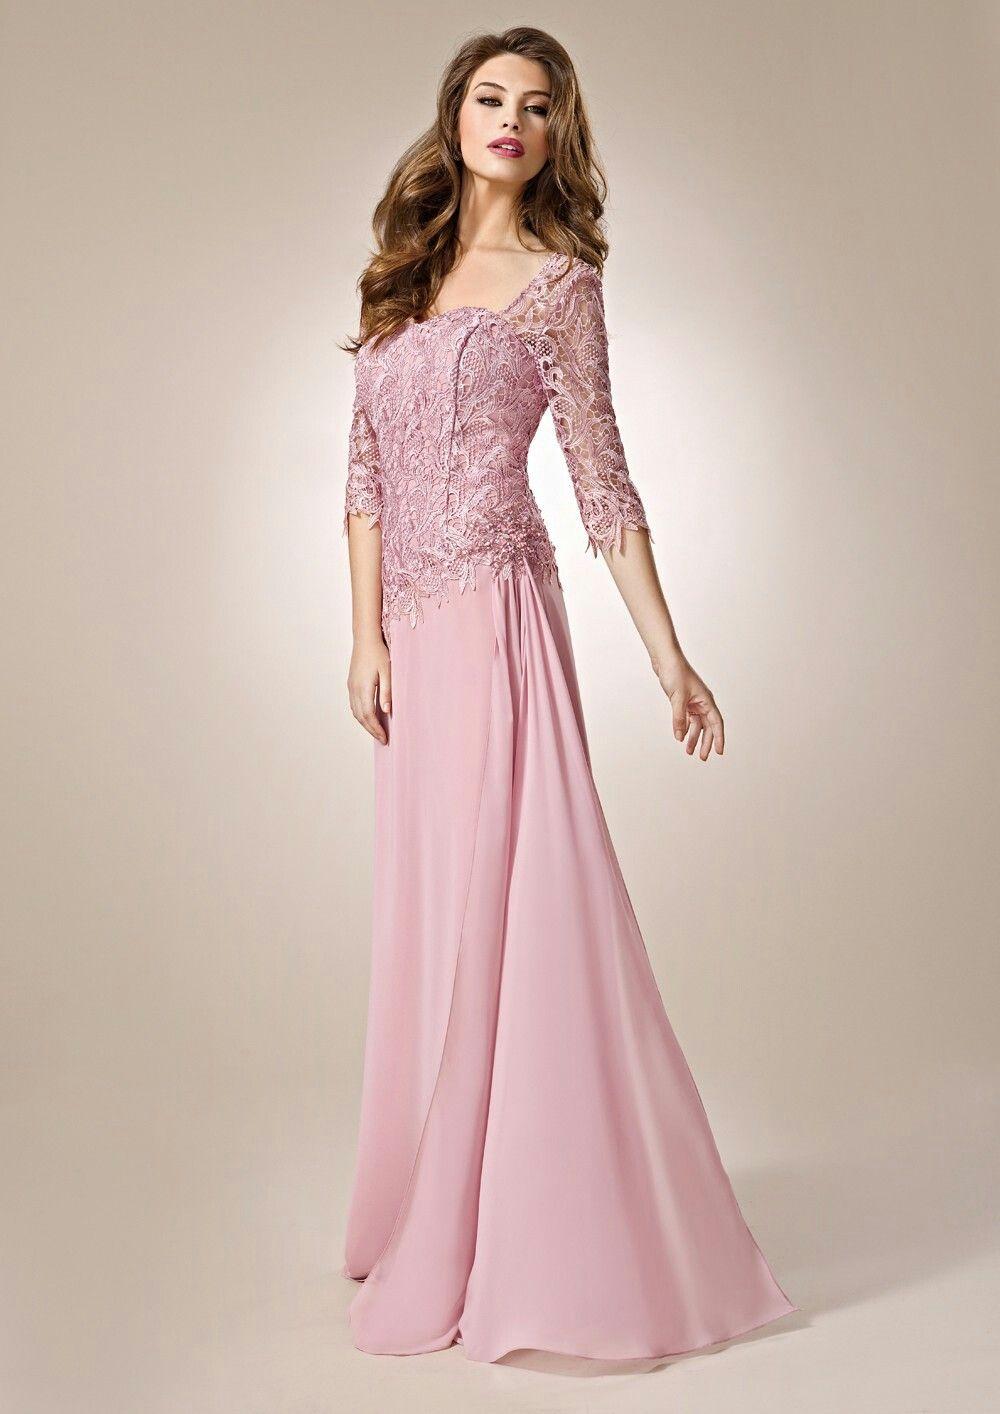 Pin de encarna asensio en vestidos fiesta | Pinterest | Vestidos ...